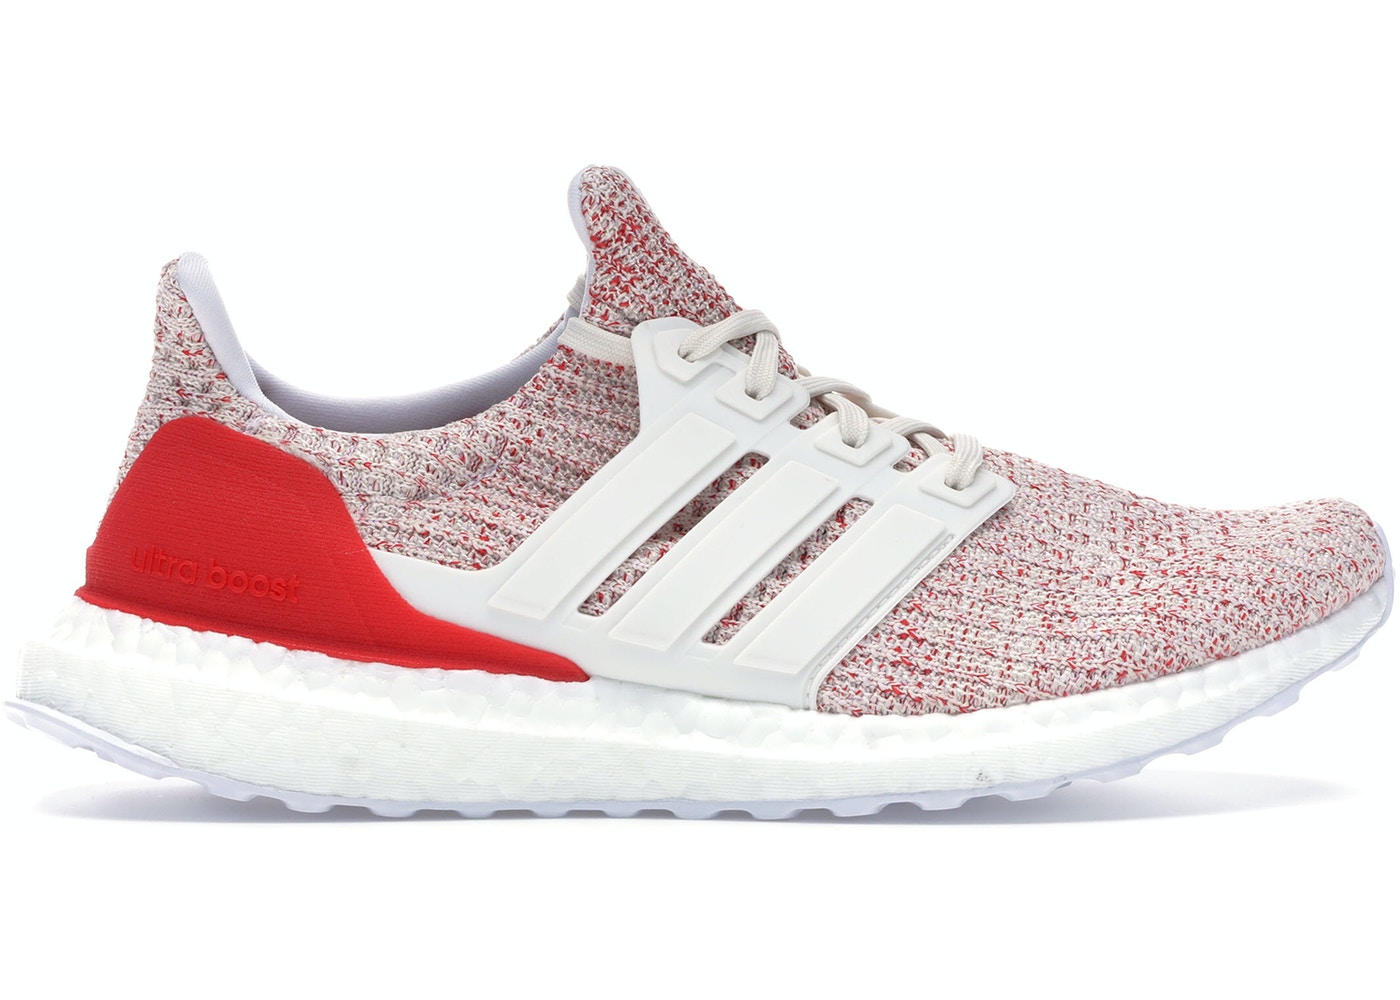 924650c6b32 adidas Ultra Boost 4.0 Chalk White Active Red (W) - DB3209